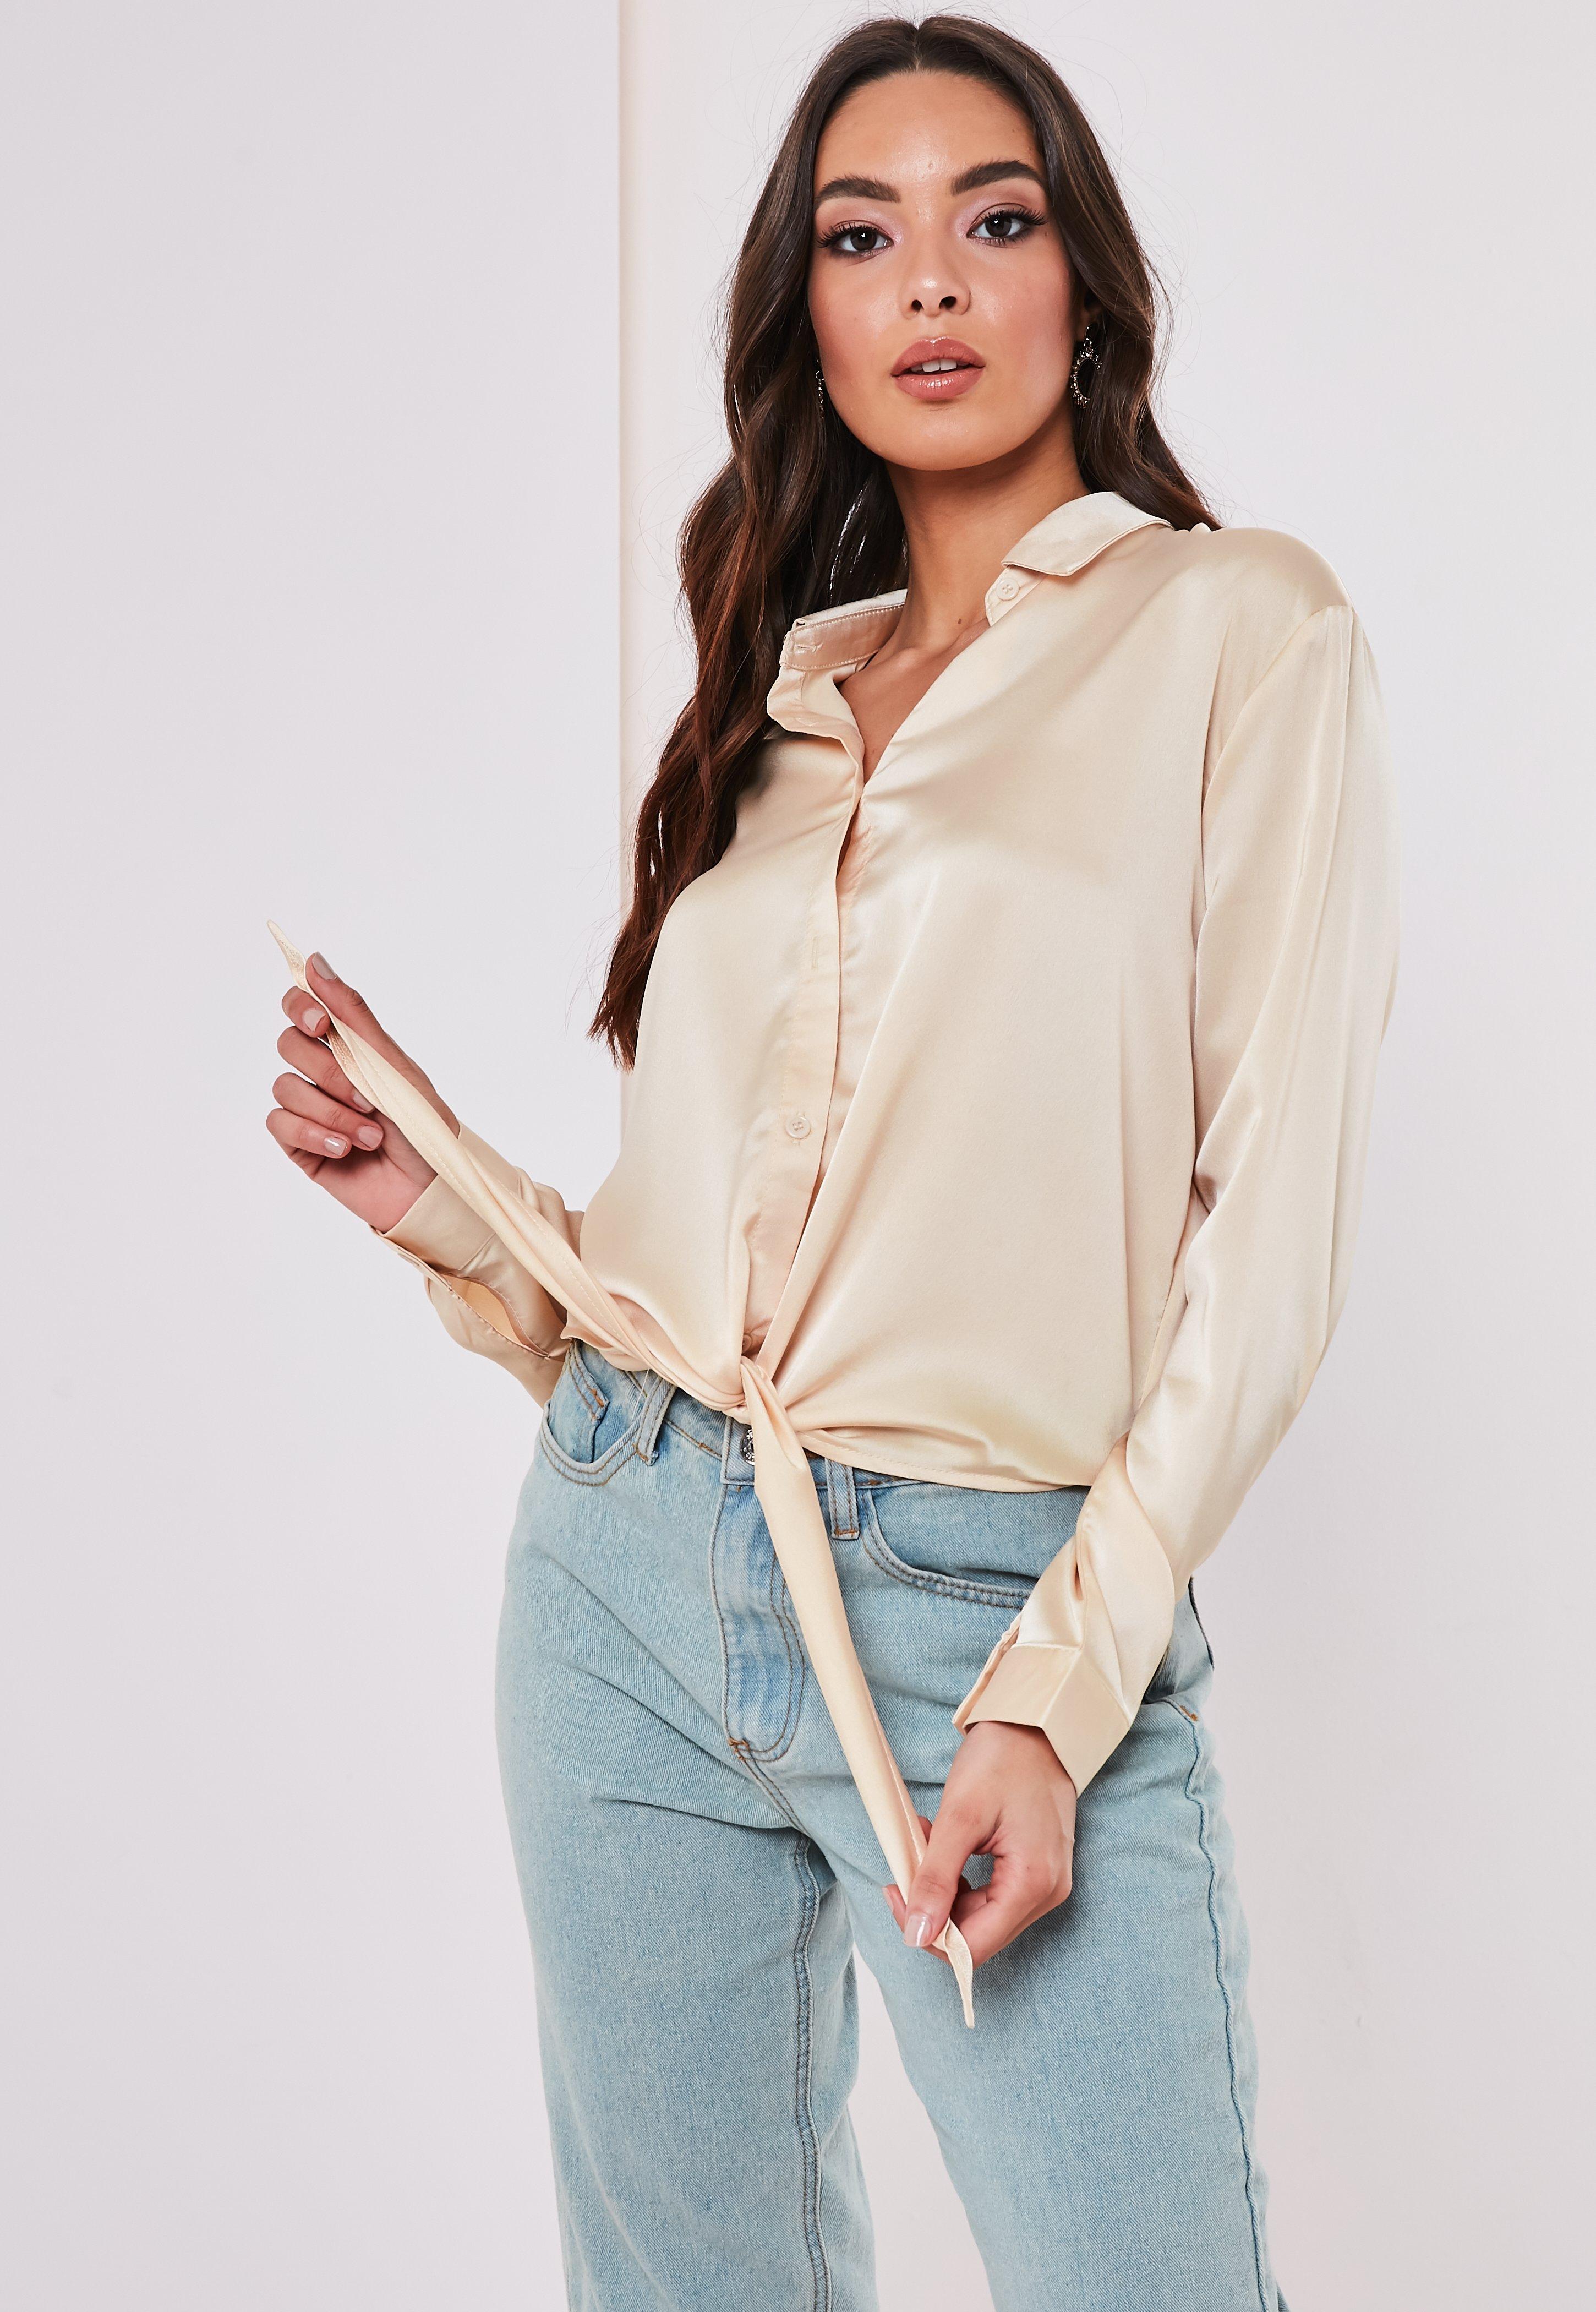 753789da Women's Shirts - Buy Shirts Online | Missguided